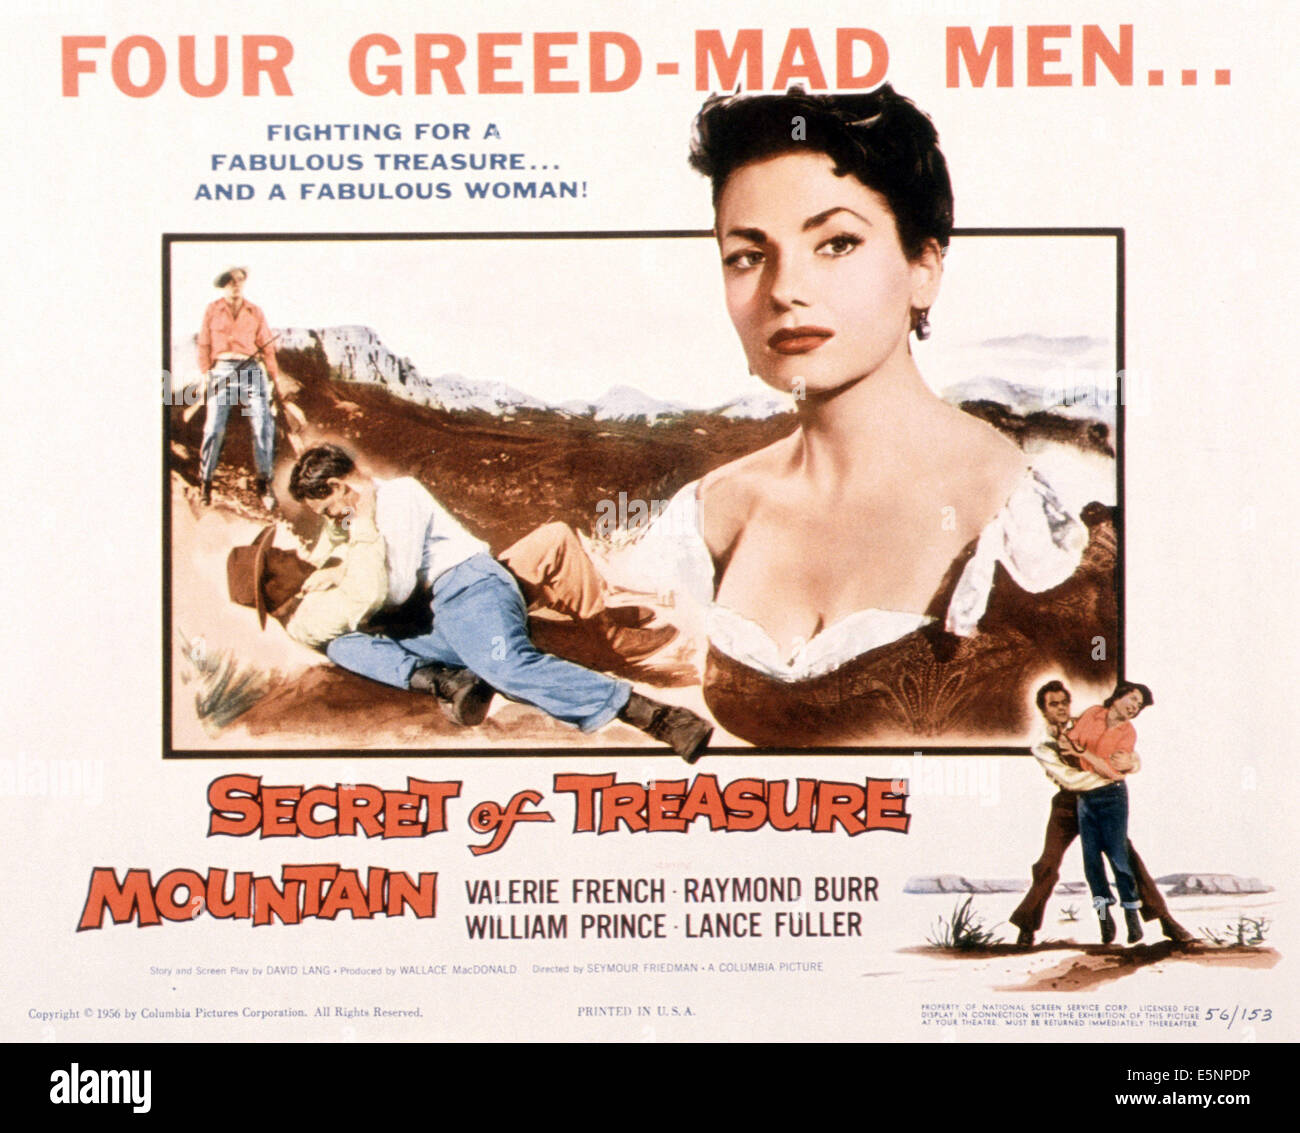 SECRET OF TREASURE MOUNTAIN, US poster, Valerie French, 1956 - Stock Image